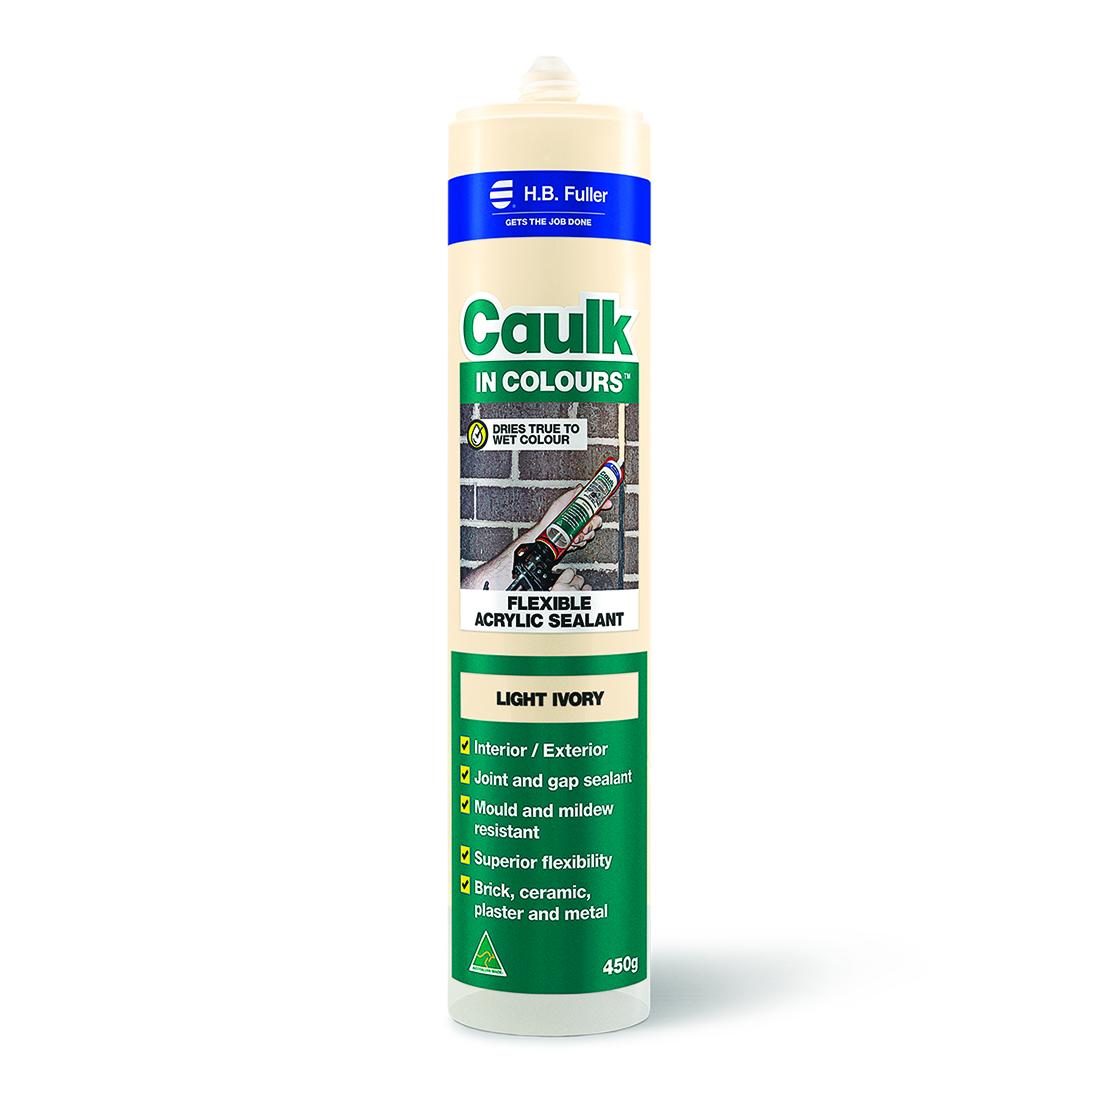 Caulk In Colours 450g Flexible Acrylic Sealant Light Ivory